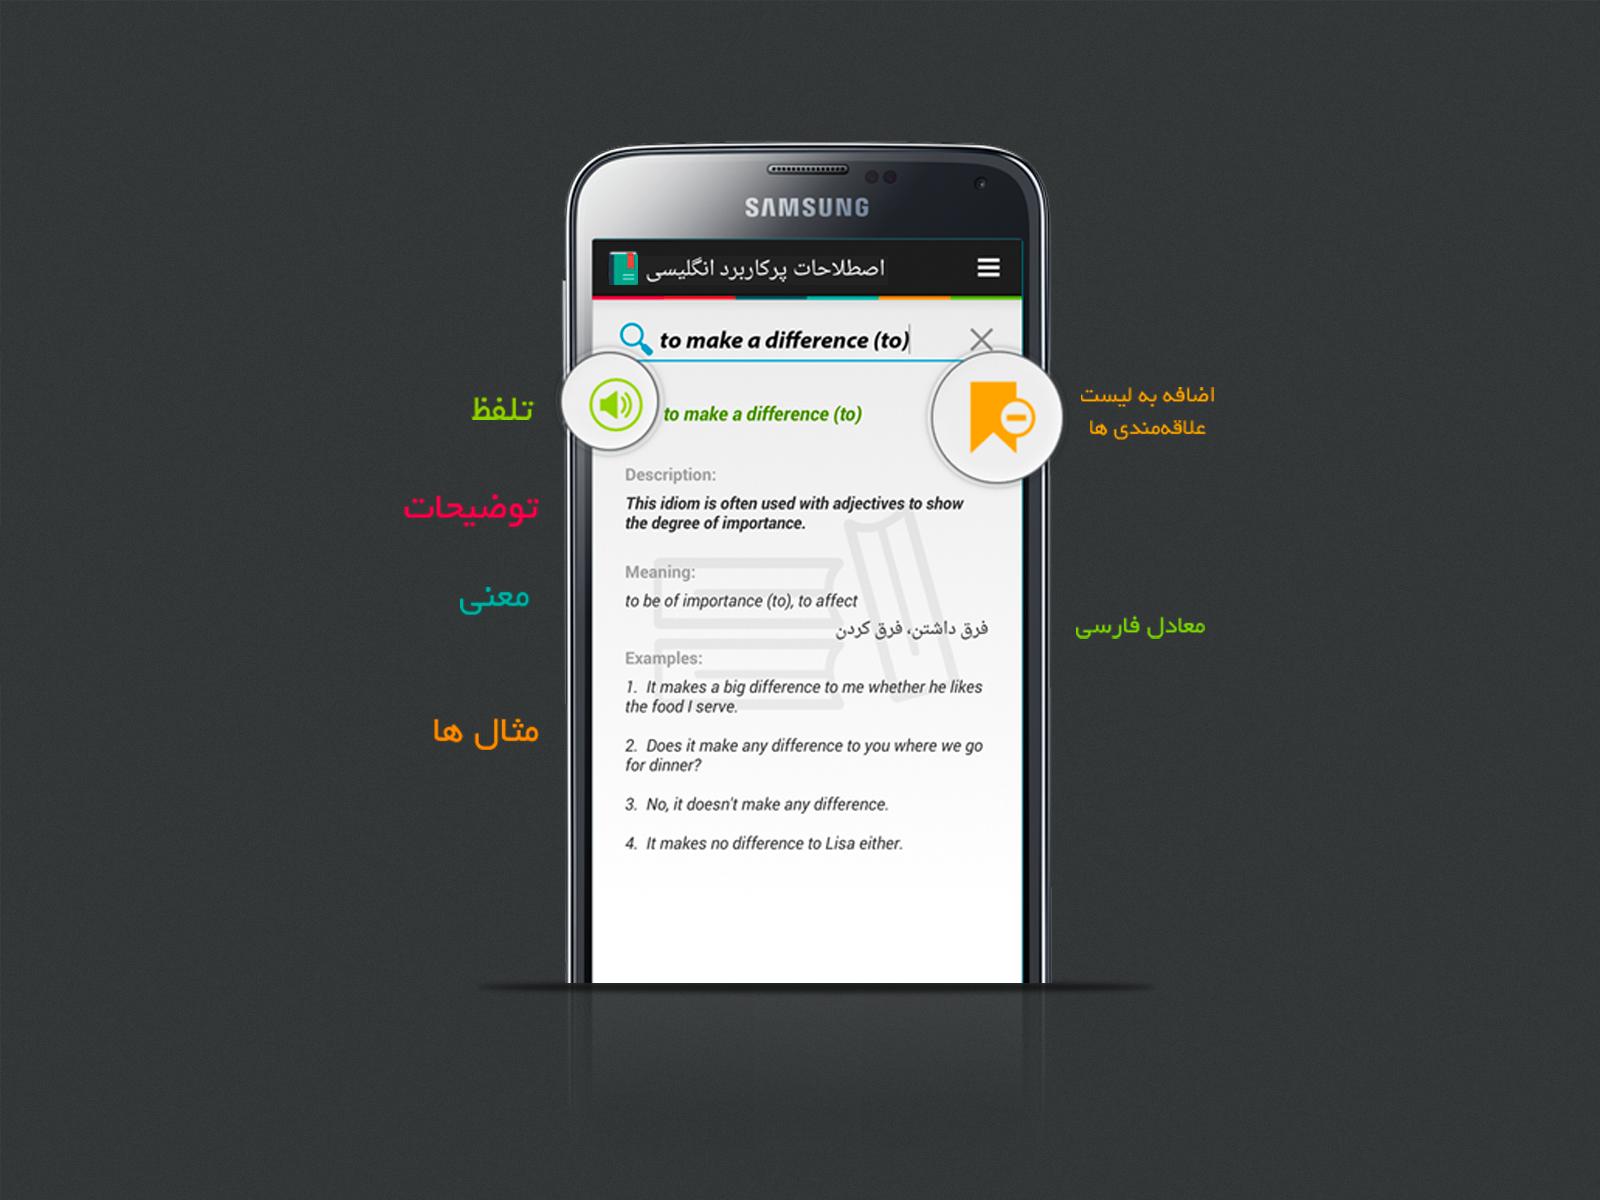 idioms - Android app by Shaho Toofani on Dribbble